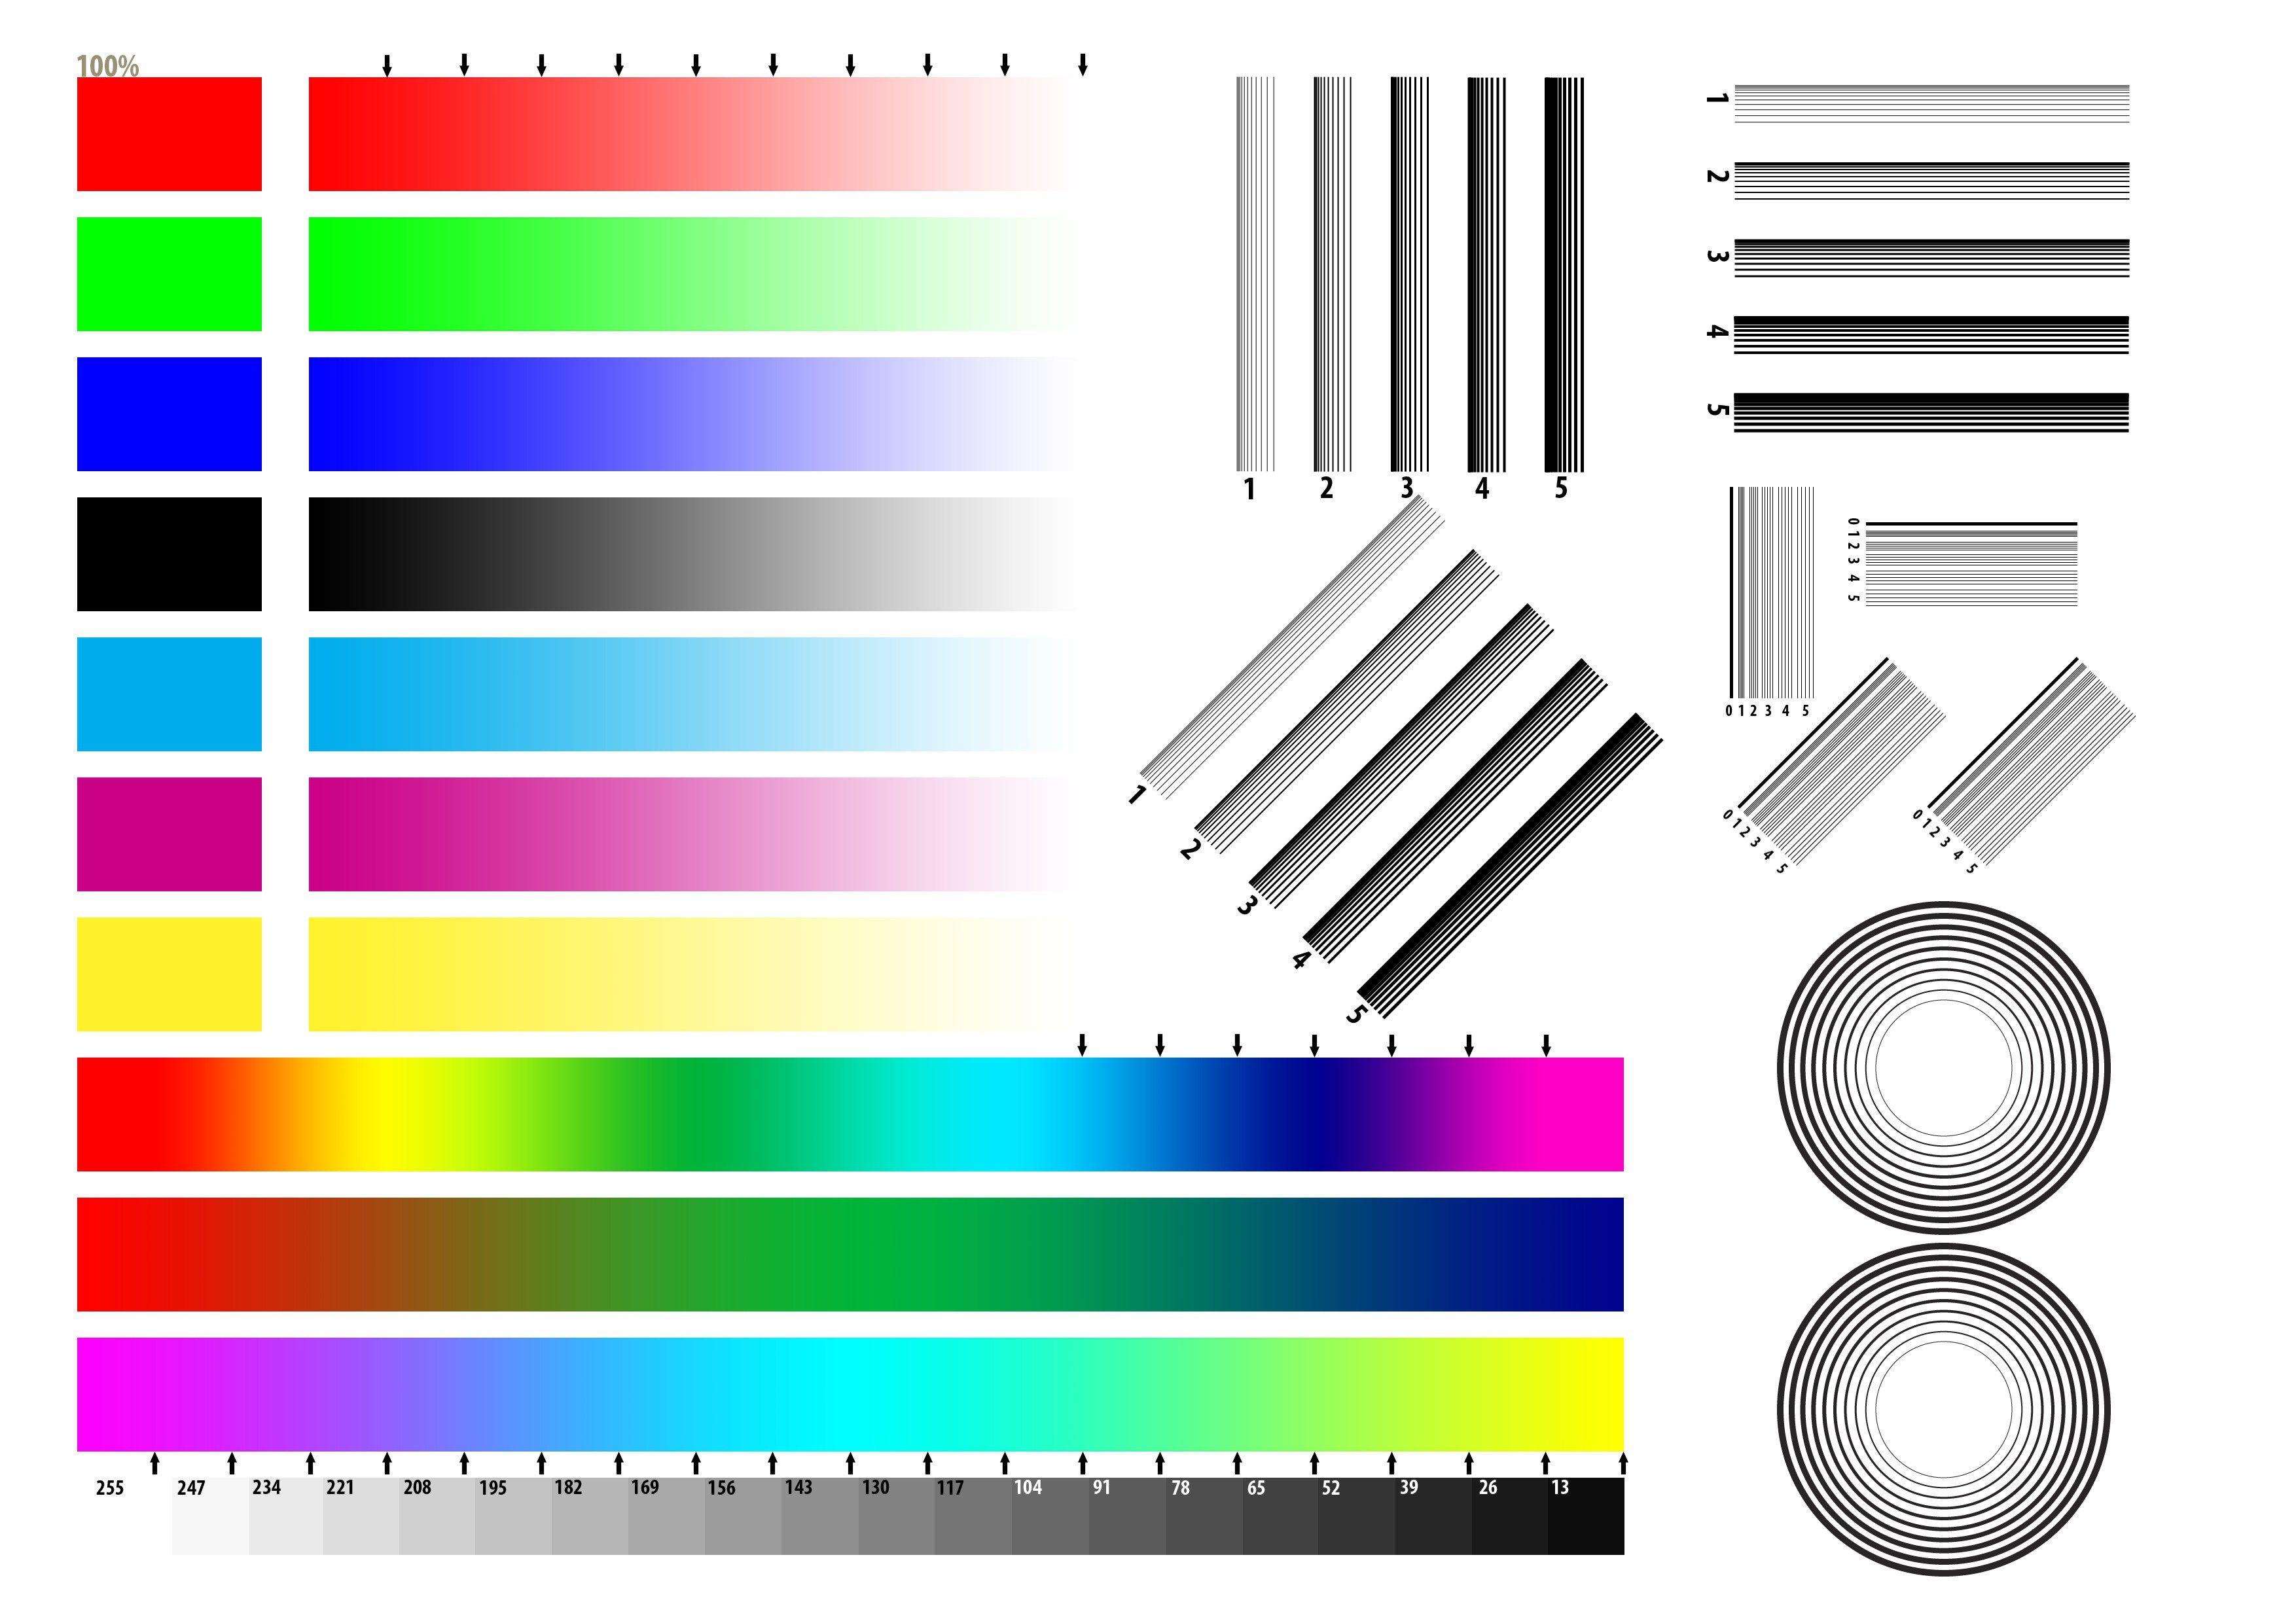 color print test page # 1